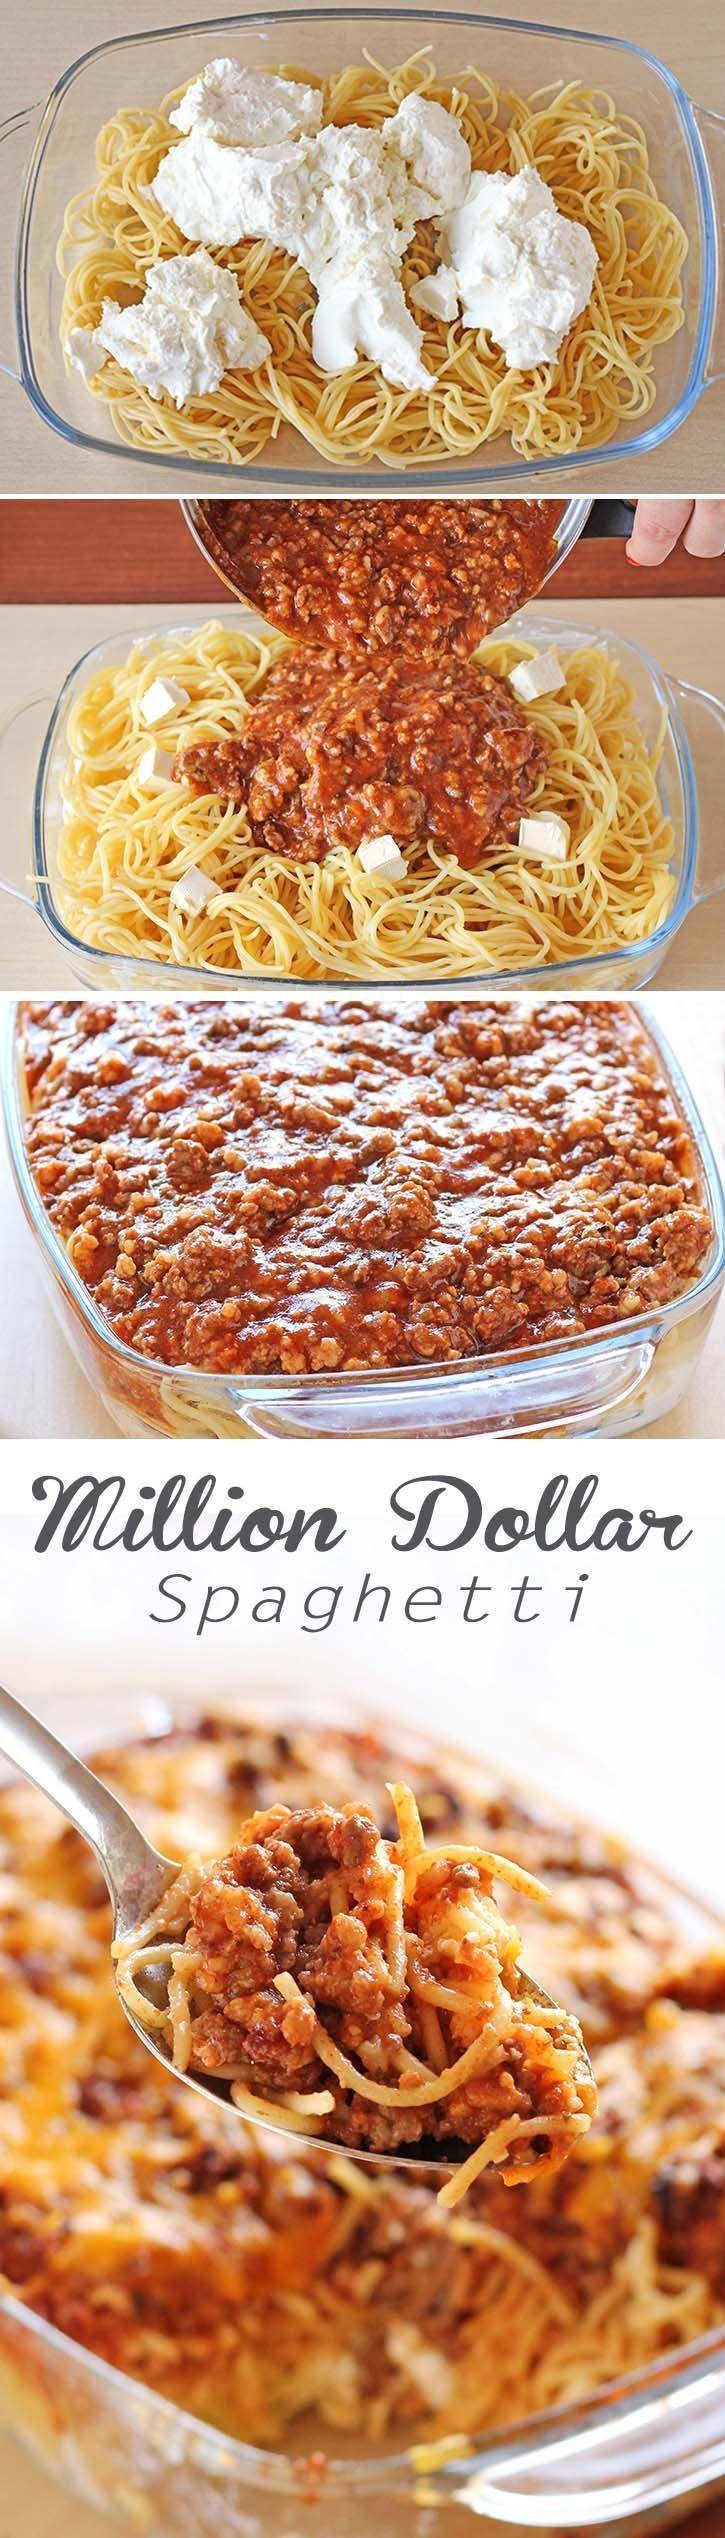 Best 25 Ricotta Cheese Recipes Ideas On Pinterest Recipes With Ricotta Cheese Ricotta And Baked Pasta Recipes